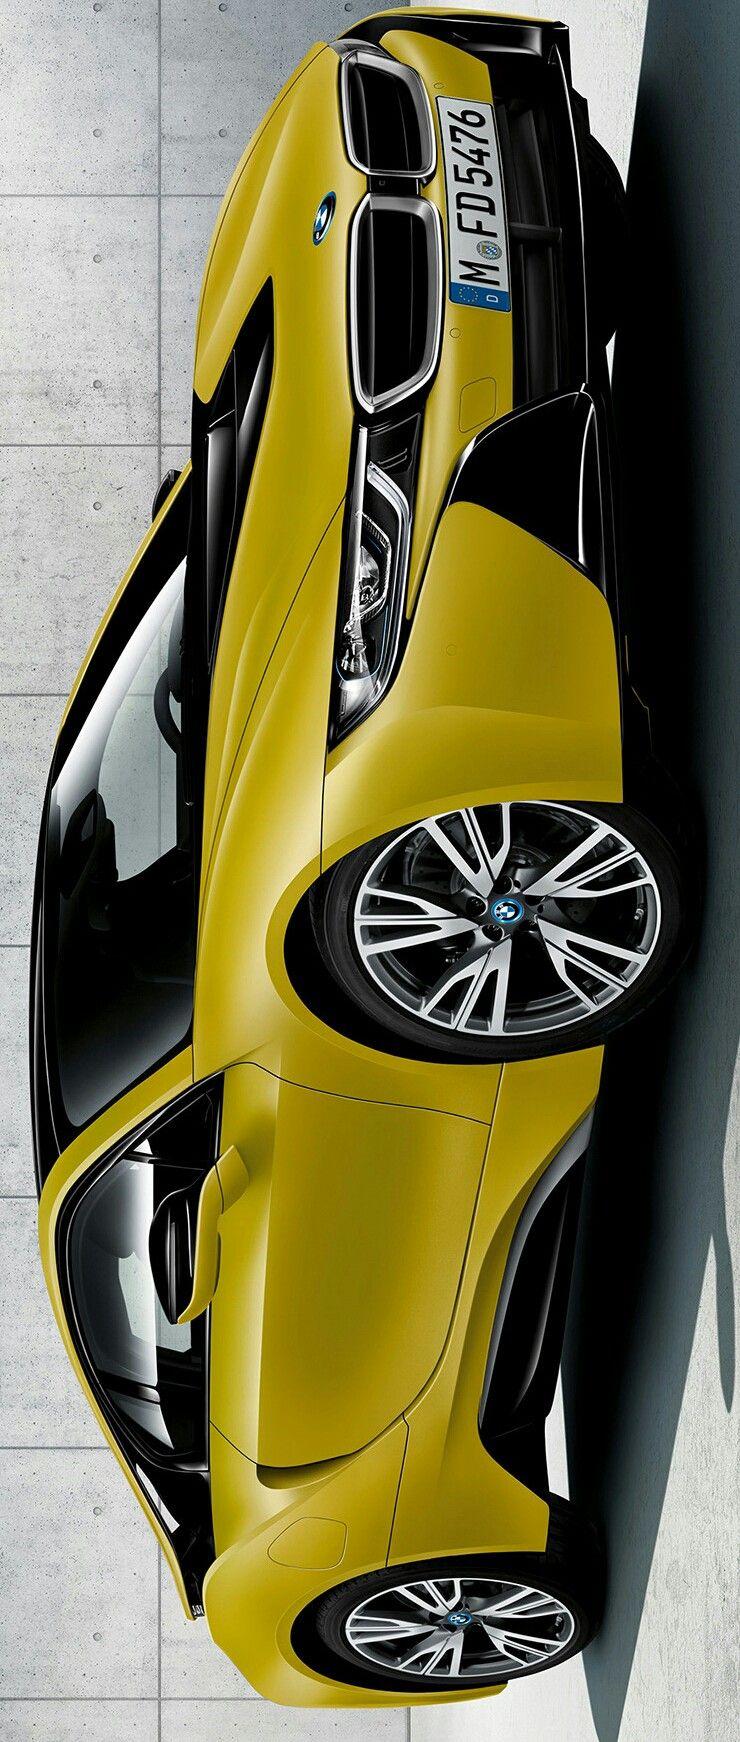 2017 Bmw I8 Protonic Frozen Yellow Edition Autozone Pinterest